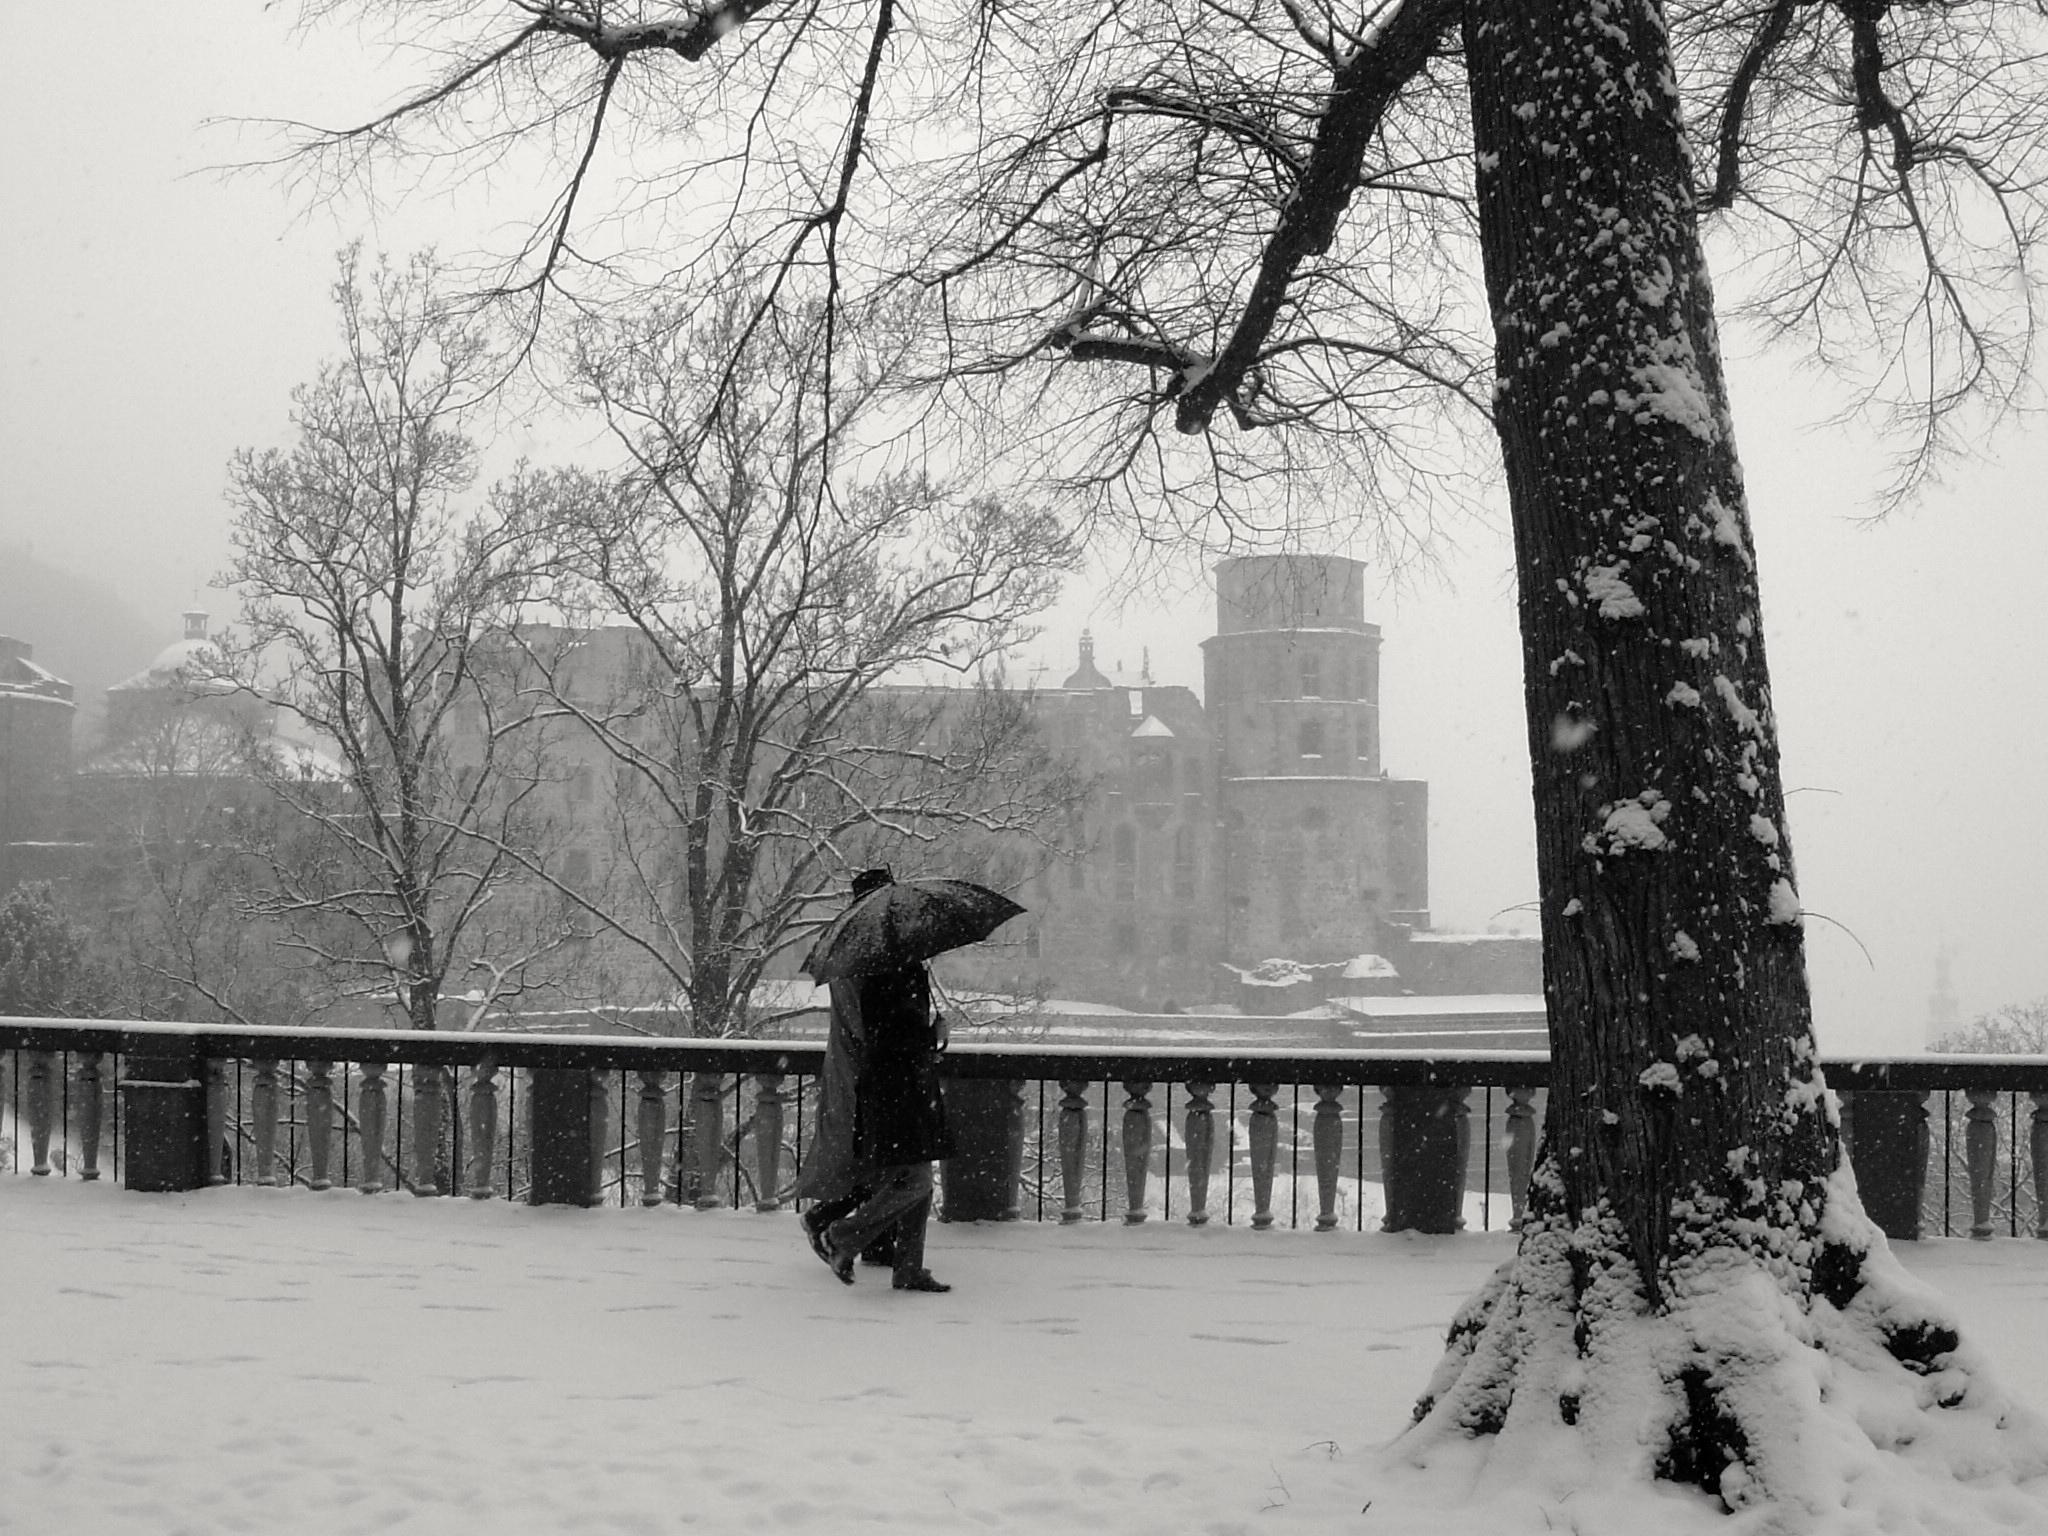 Mitchell, Tricia WHITE Heidelberg Castle in Snow Capture the Color Contest